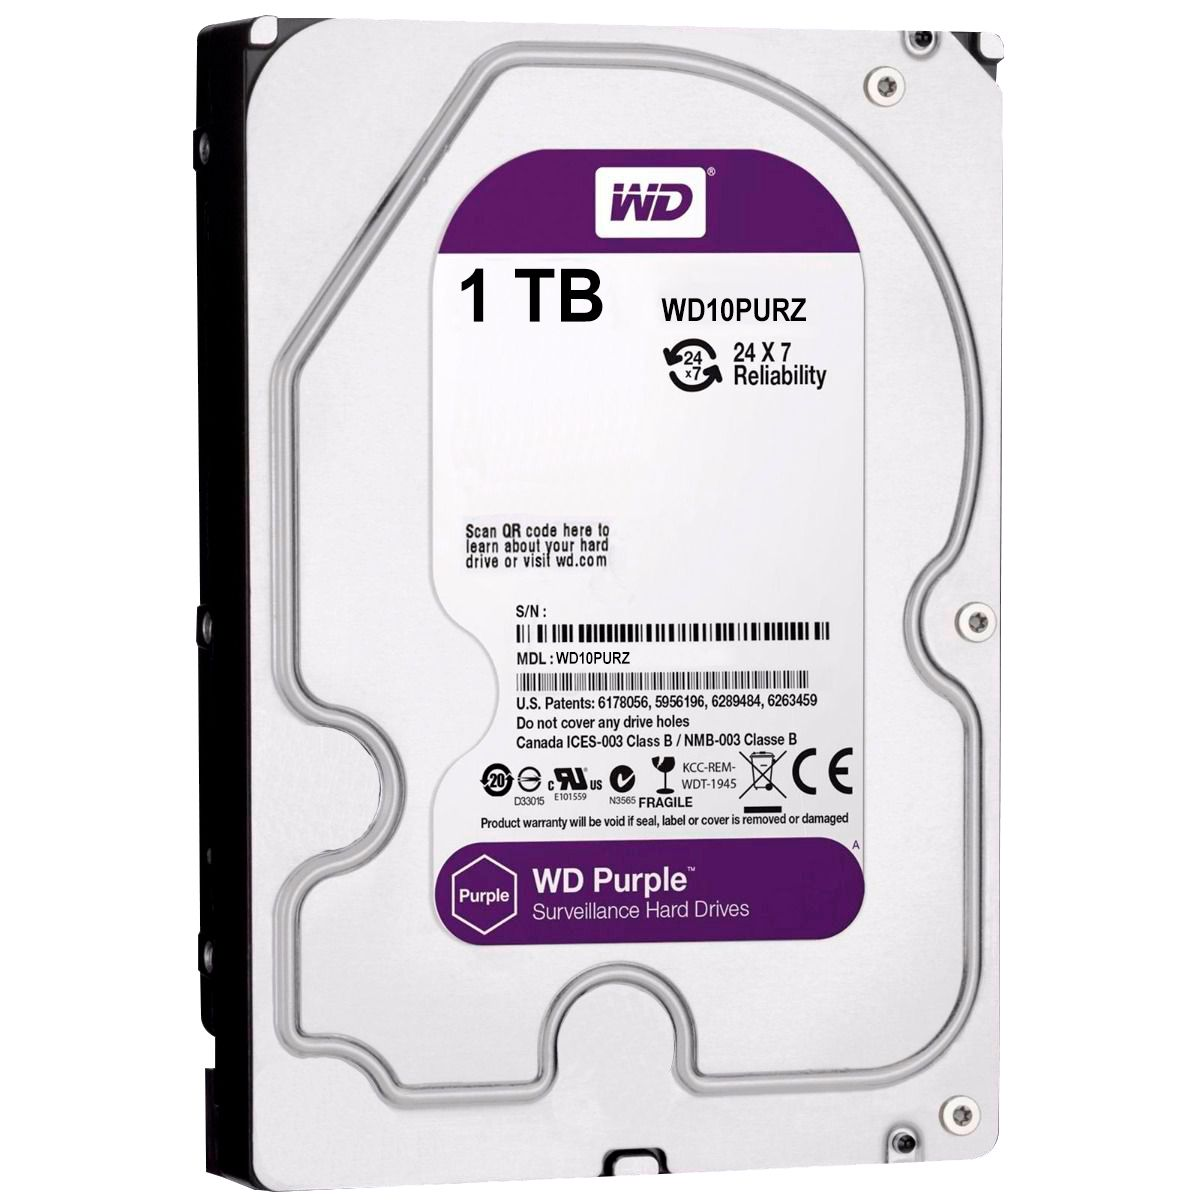 DVR 08 Canais Intelbras 4K MHDX 5108 8MP + HD 1TB WD Purple  - Tudo Forte